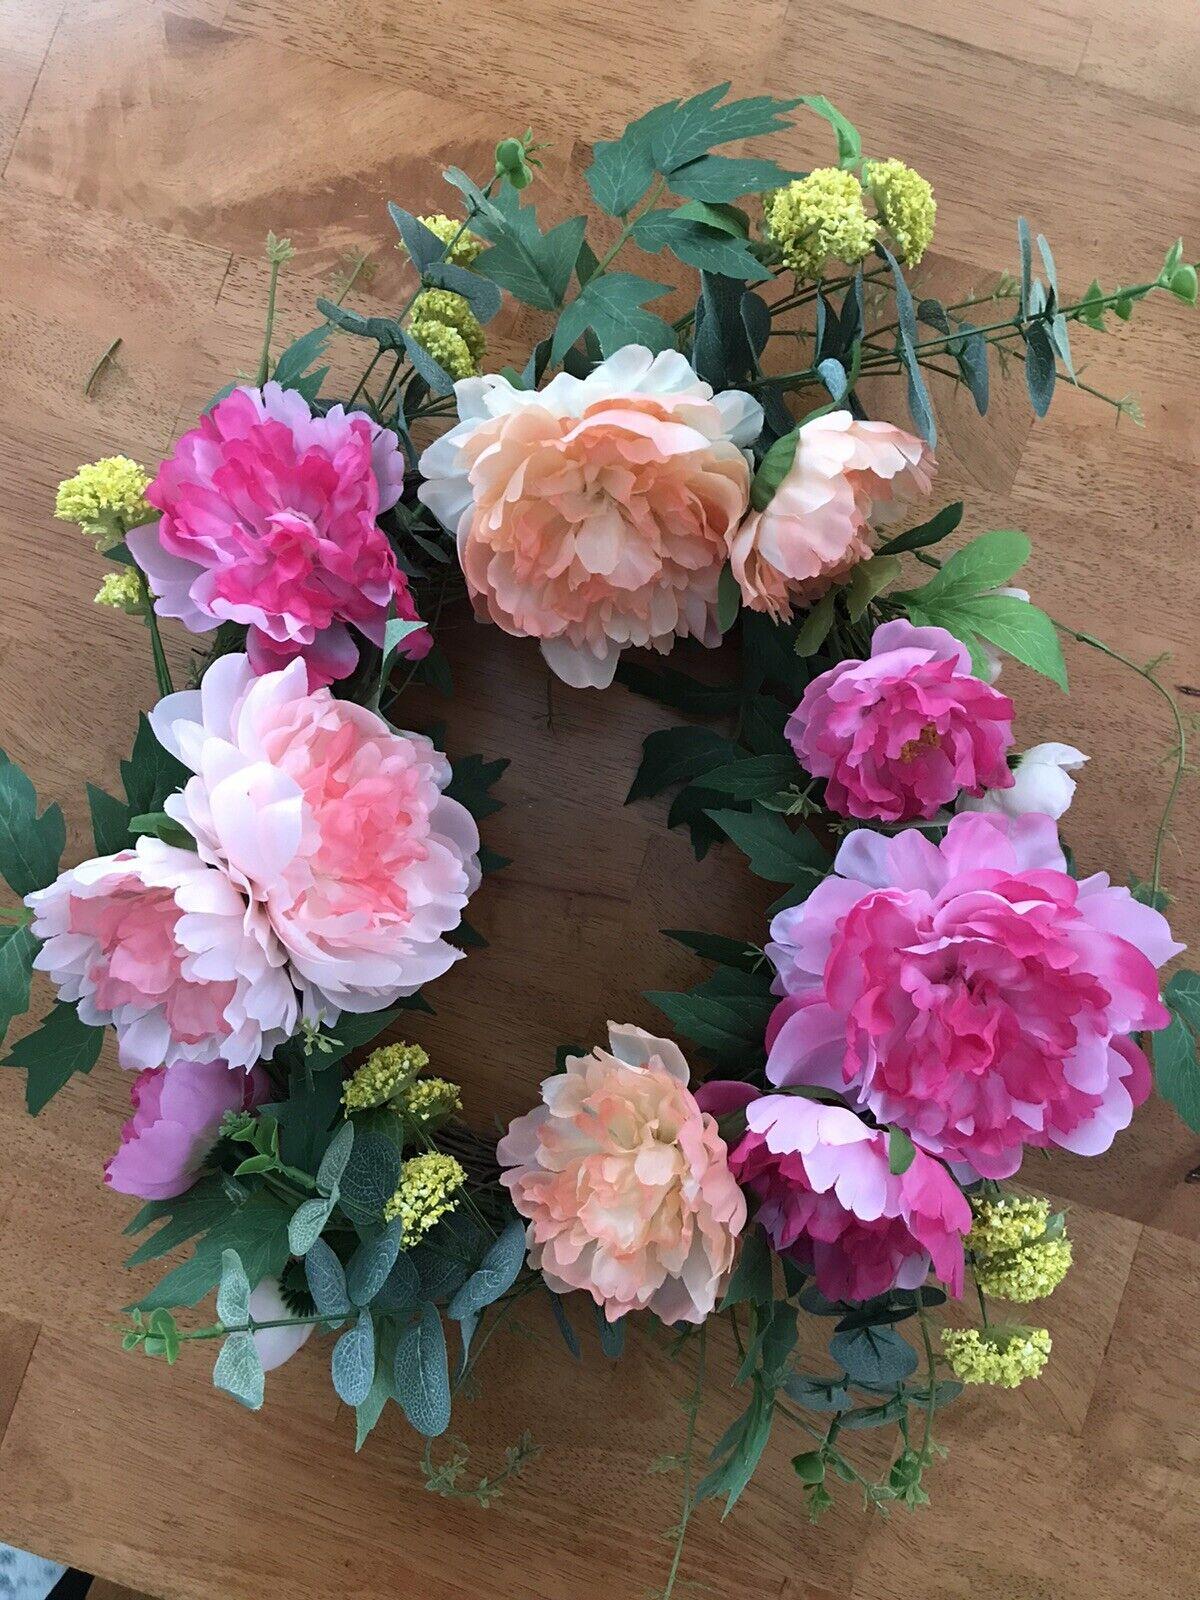 35cm Artificial Rose Flower Wreath Door Hanging Peony Garland WeddingHome Decor